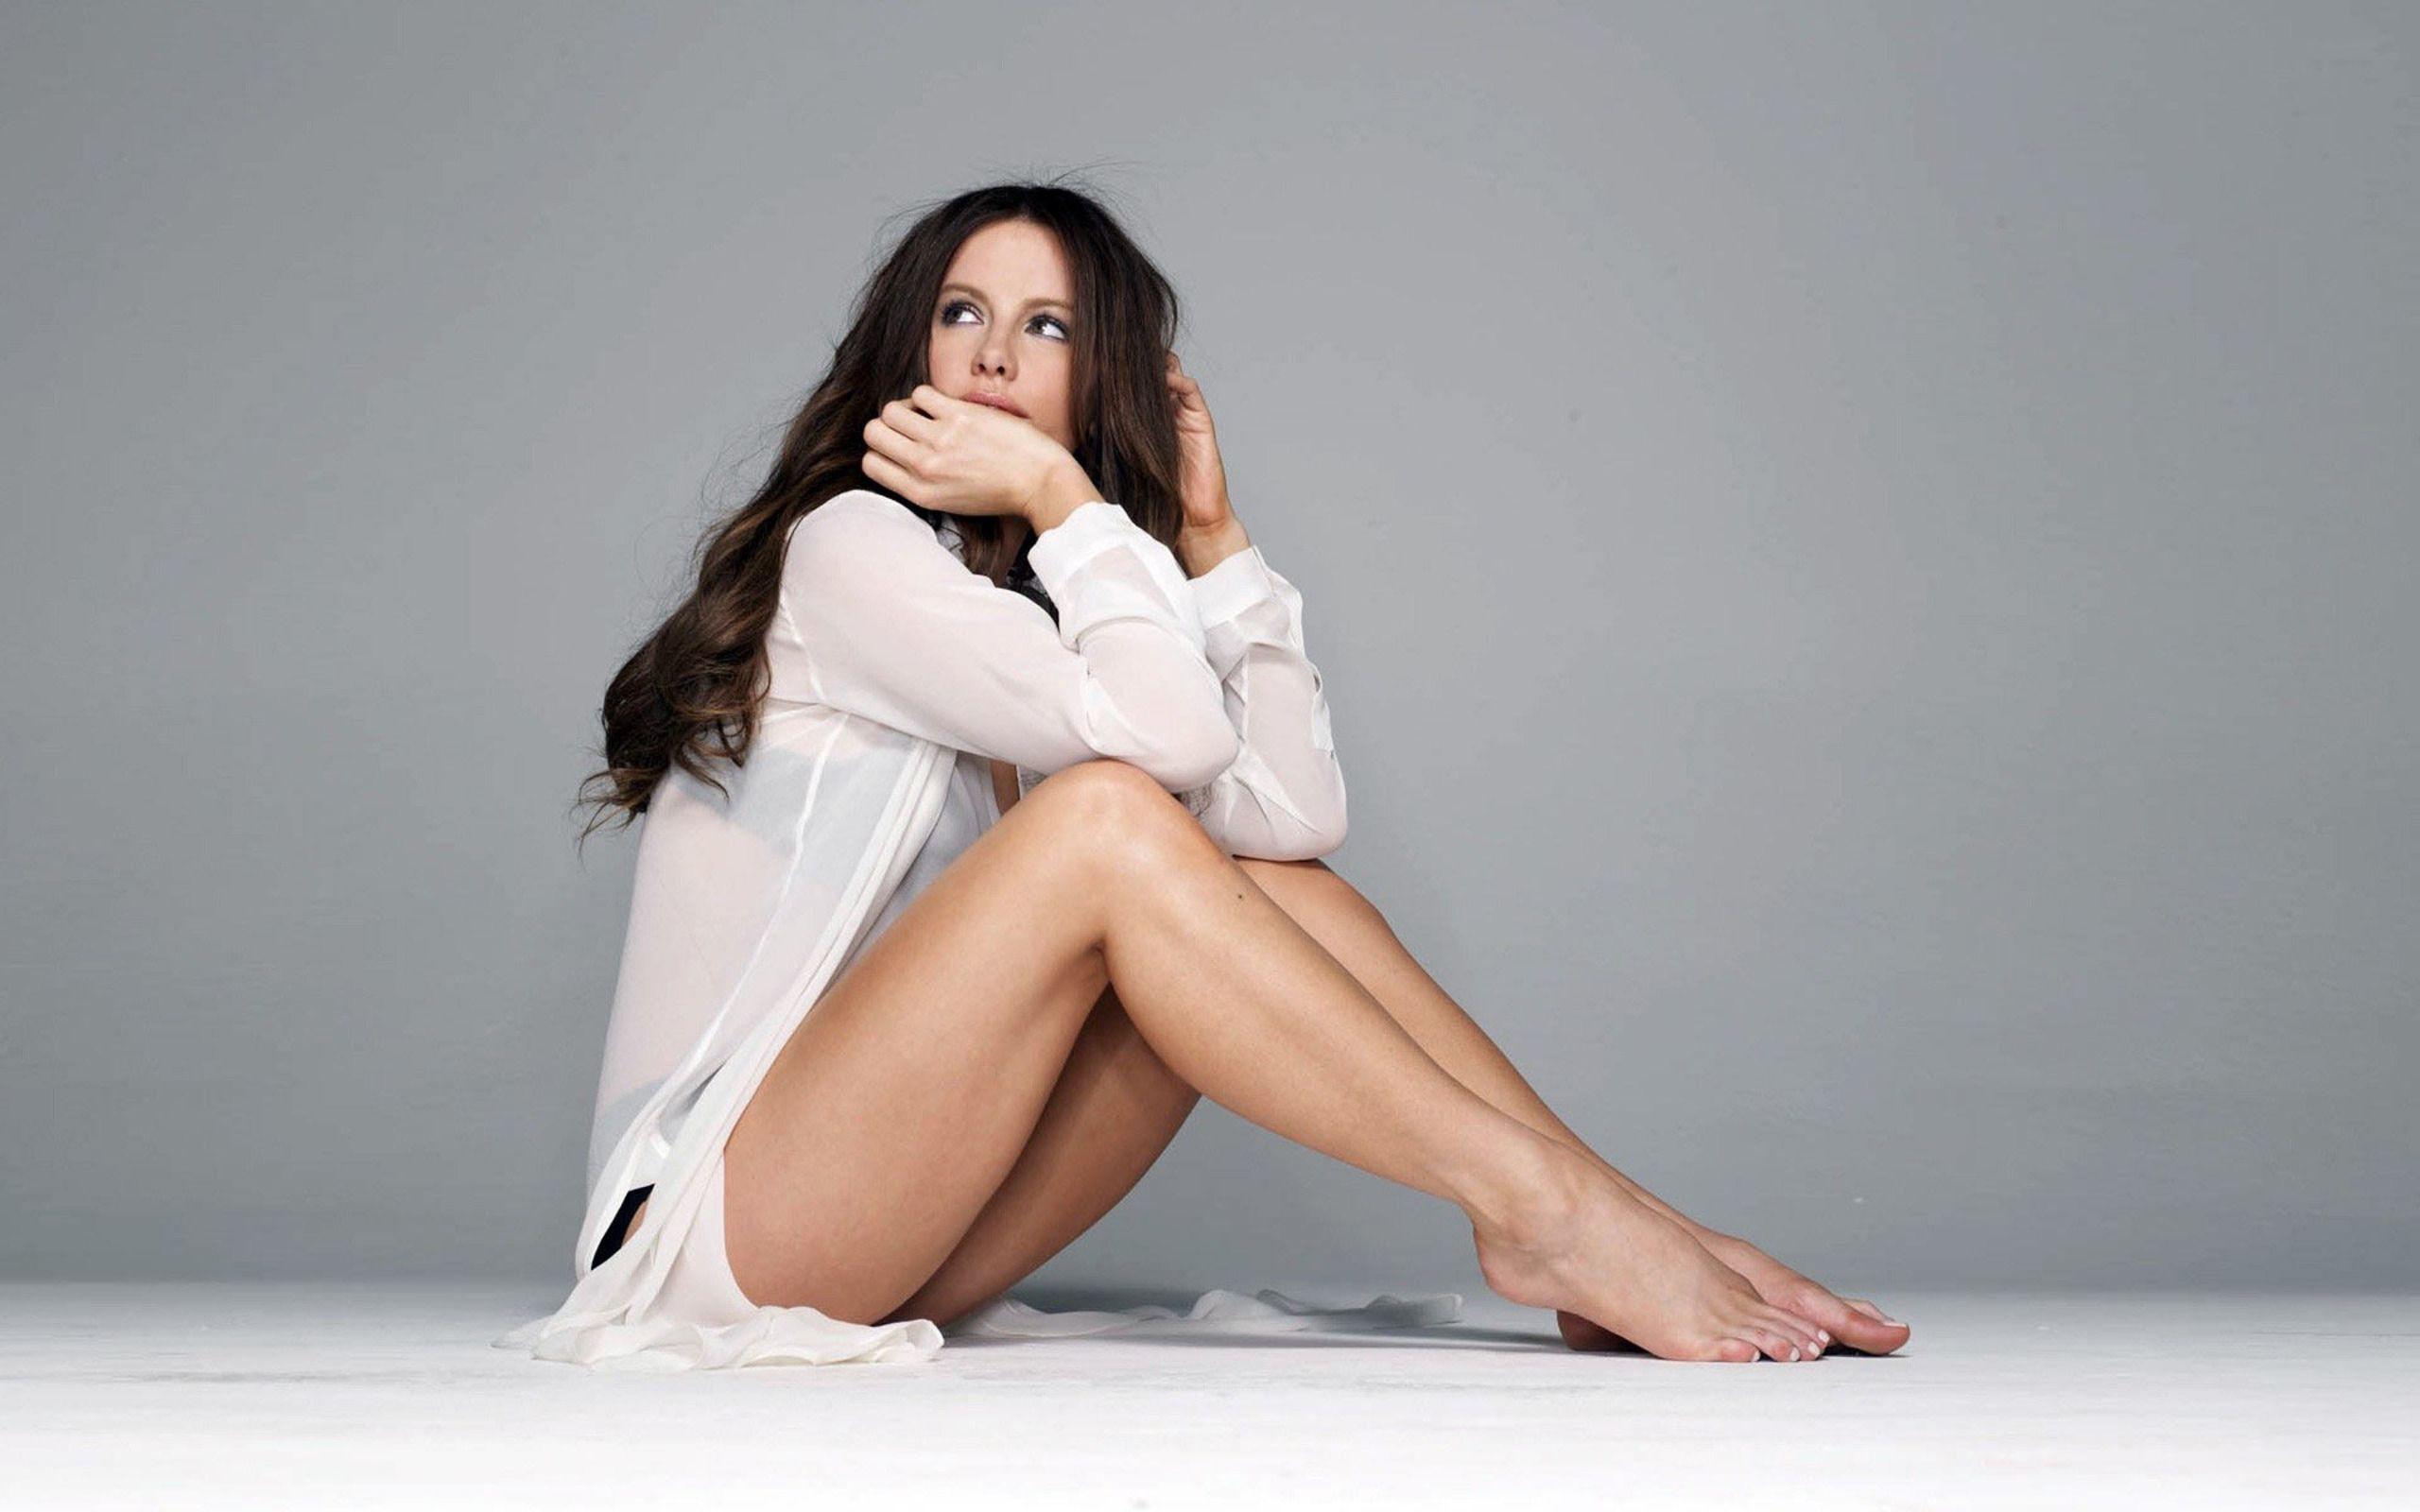 829004565_Kate_Beckinsale_Legs_Actress_122_207lo.jpg